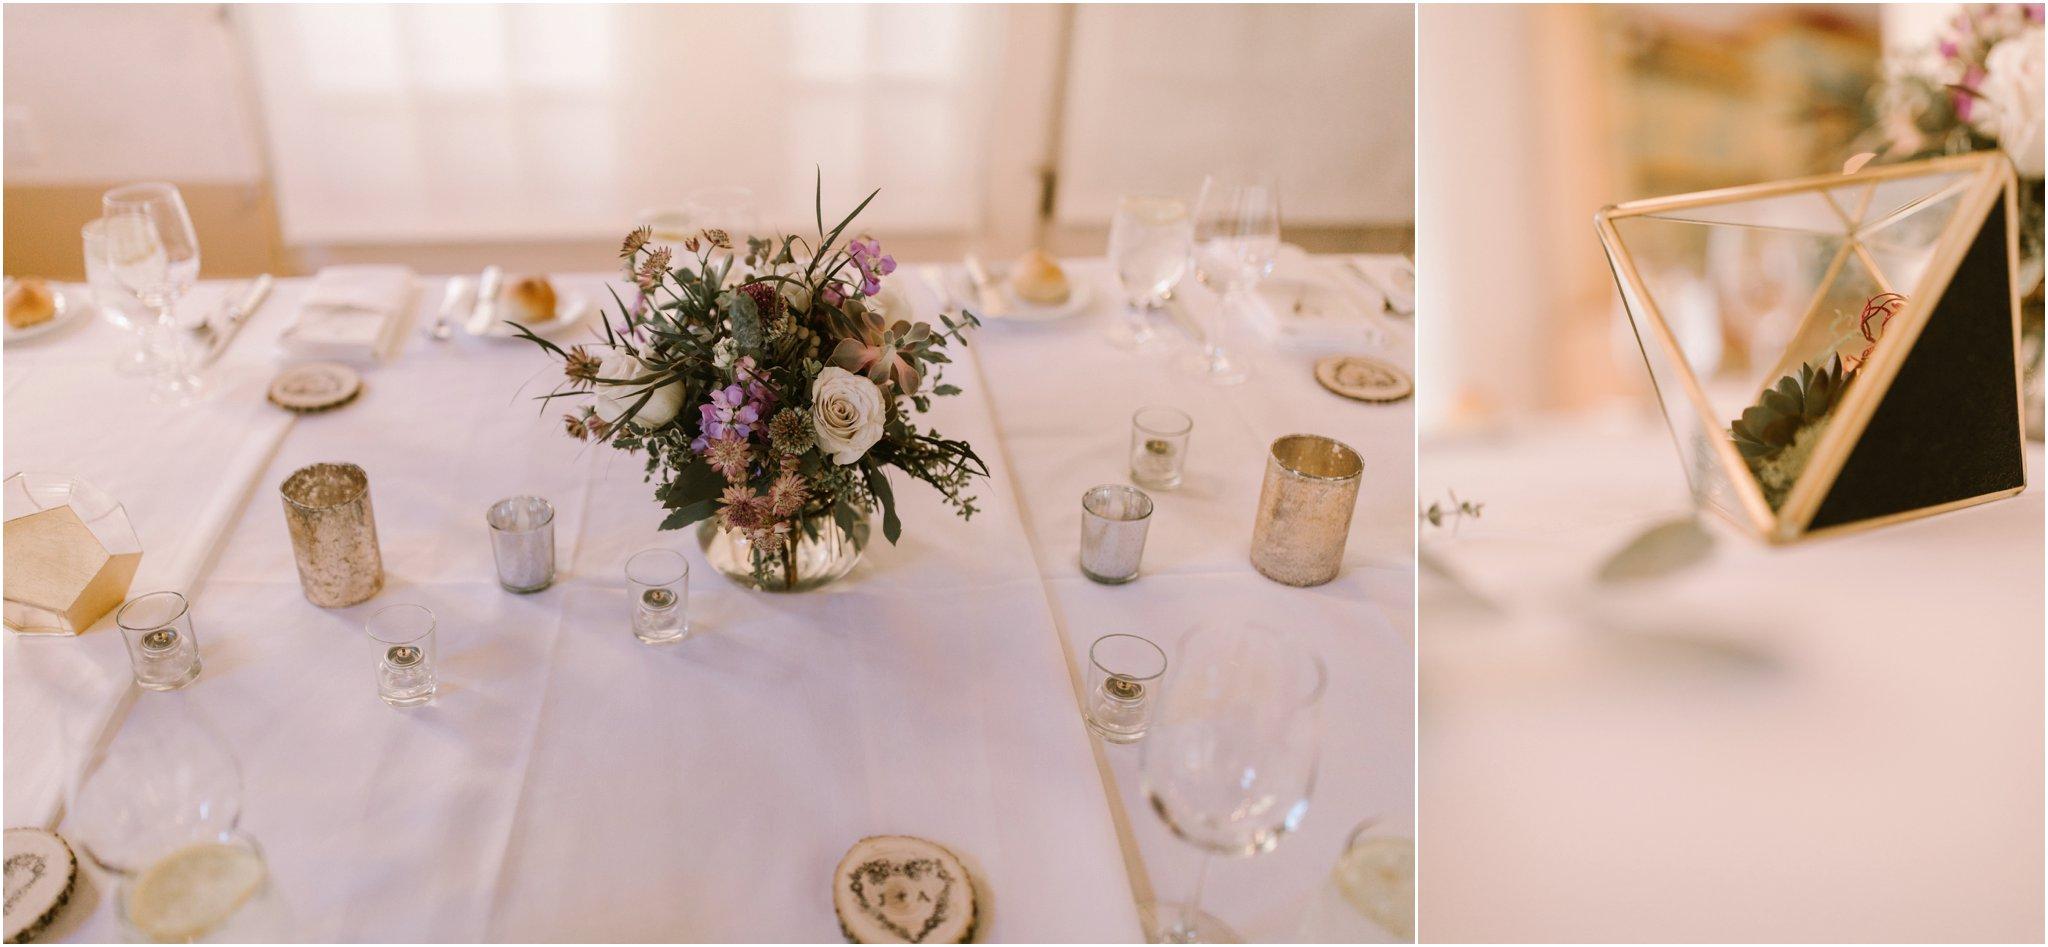 0064Blue Rose Photography_ Albuquerque and Santa Fe Wedding Photographer_ New Mexico Wedding Photography